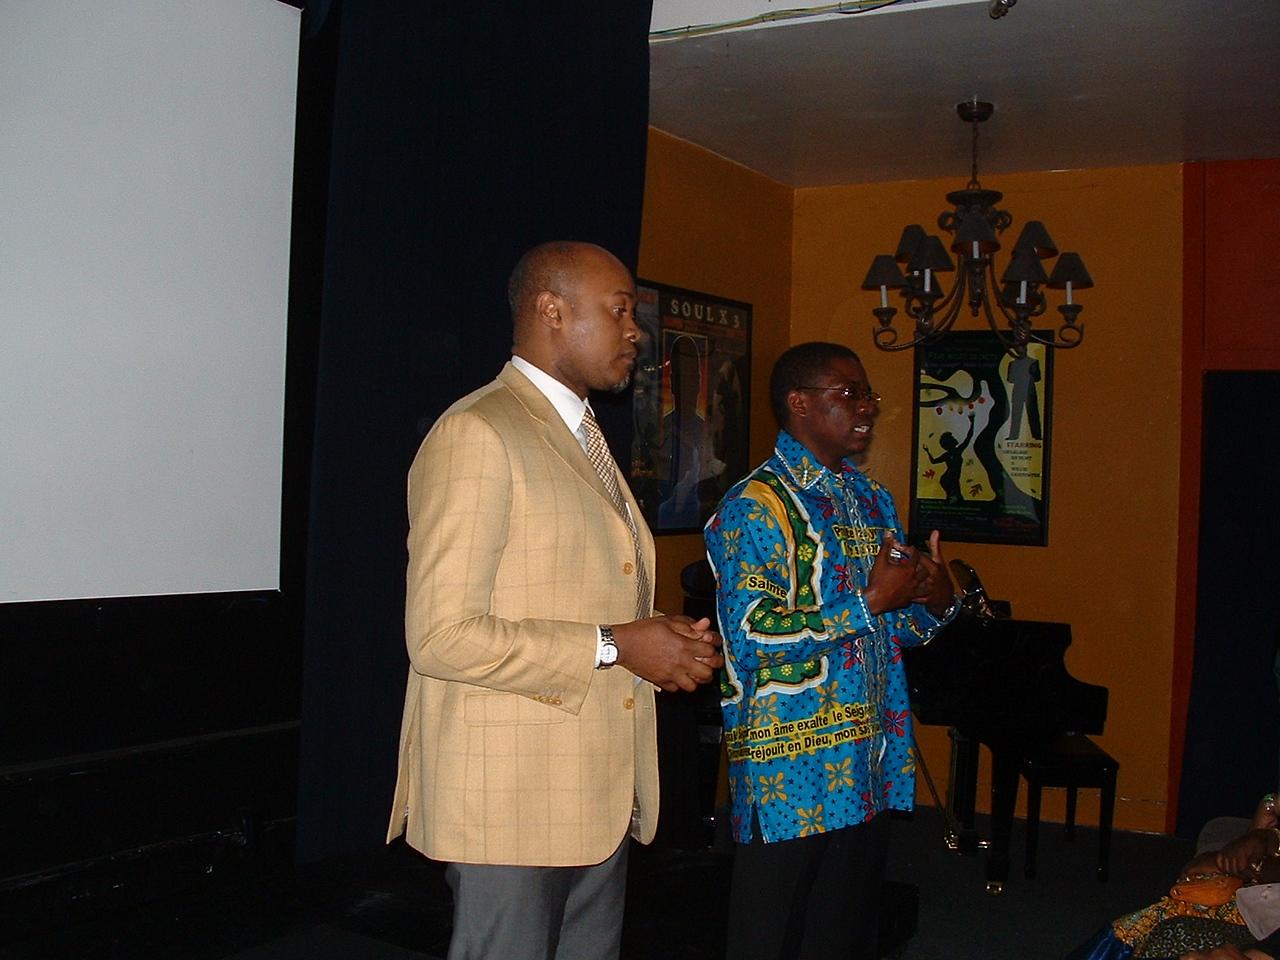 Guy Patrice Lumumba addresses gathering with help of interpreter